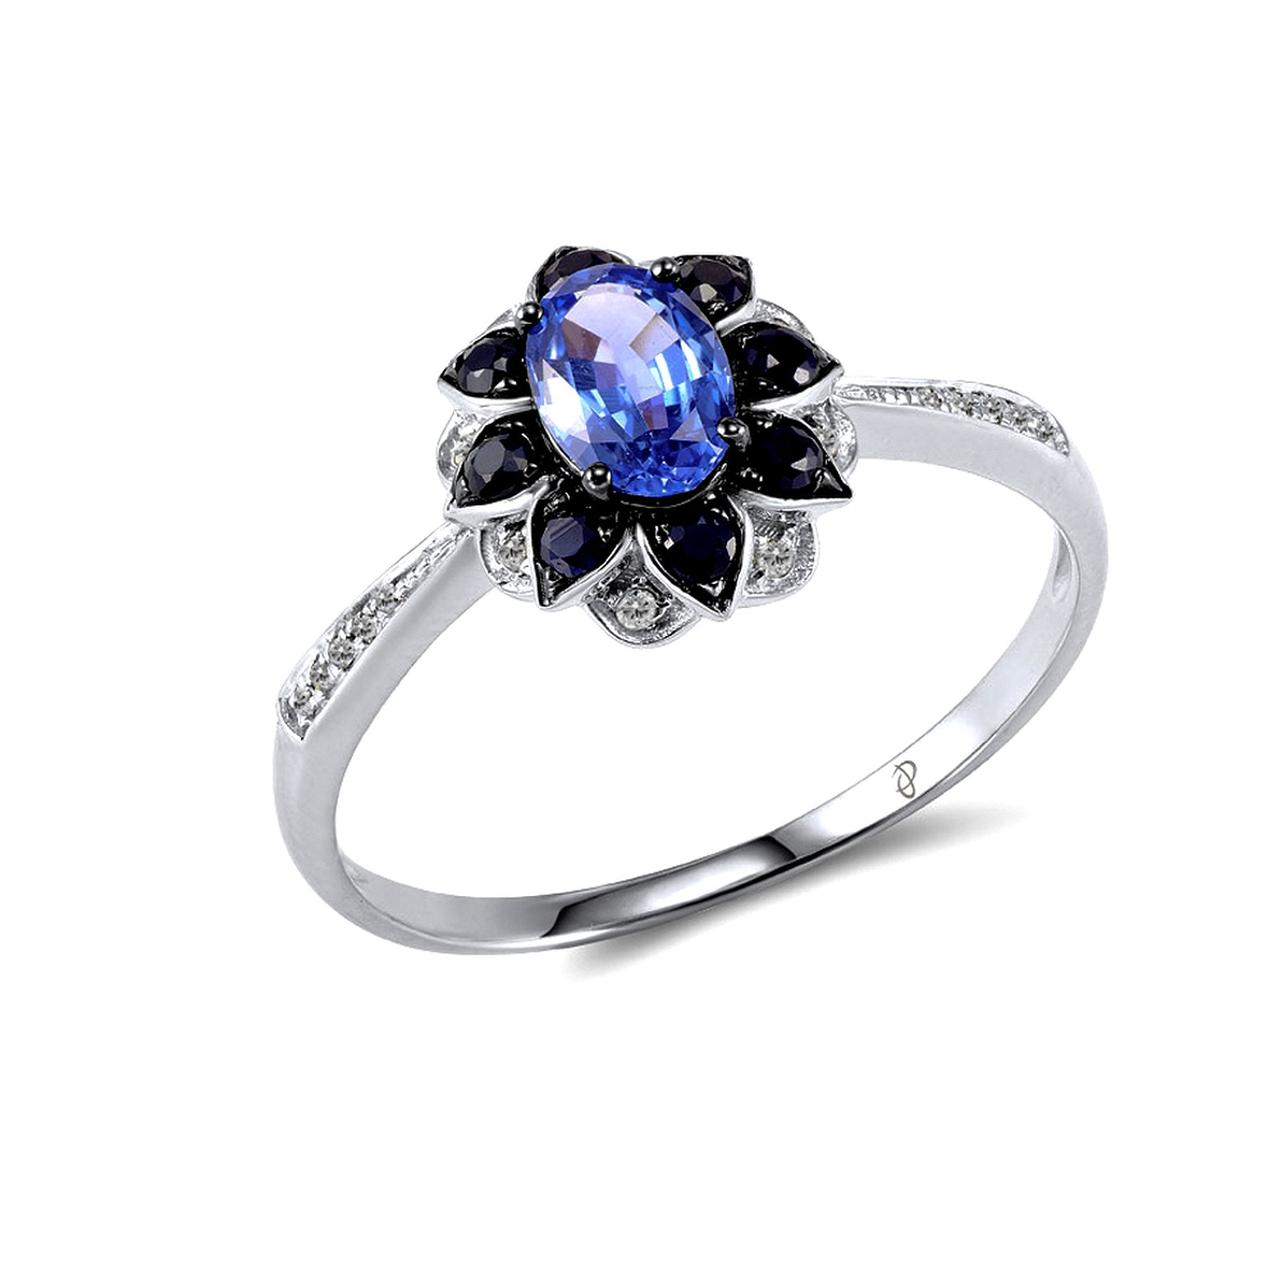 Золотое кольцо с бриллиантами и сапфирами, размер 16.5 (1552854)